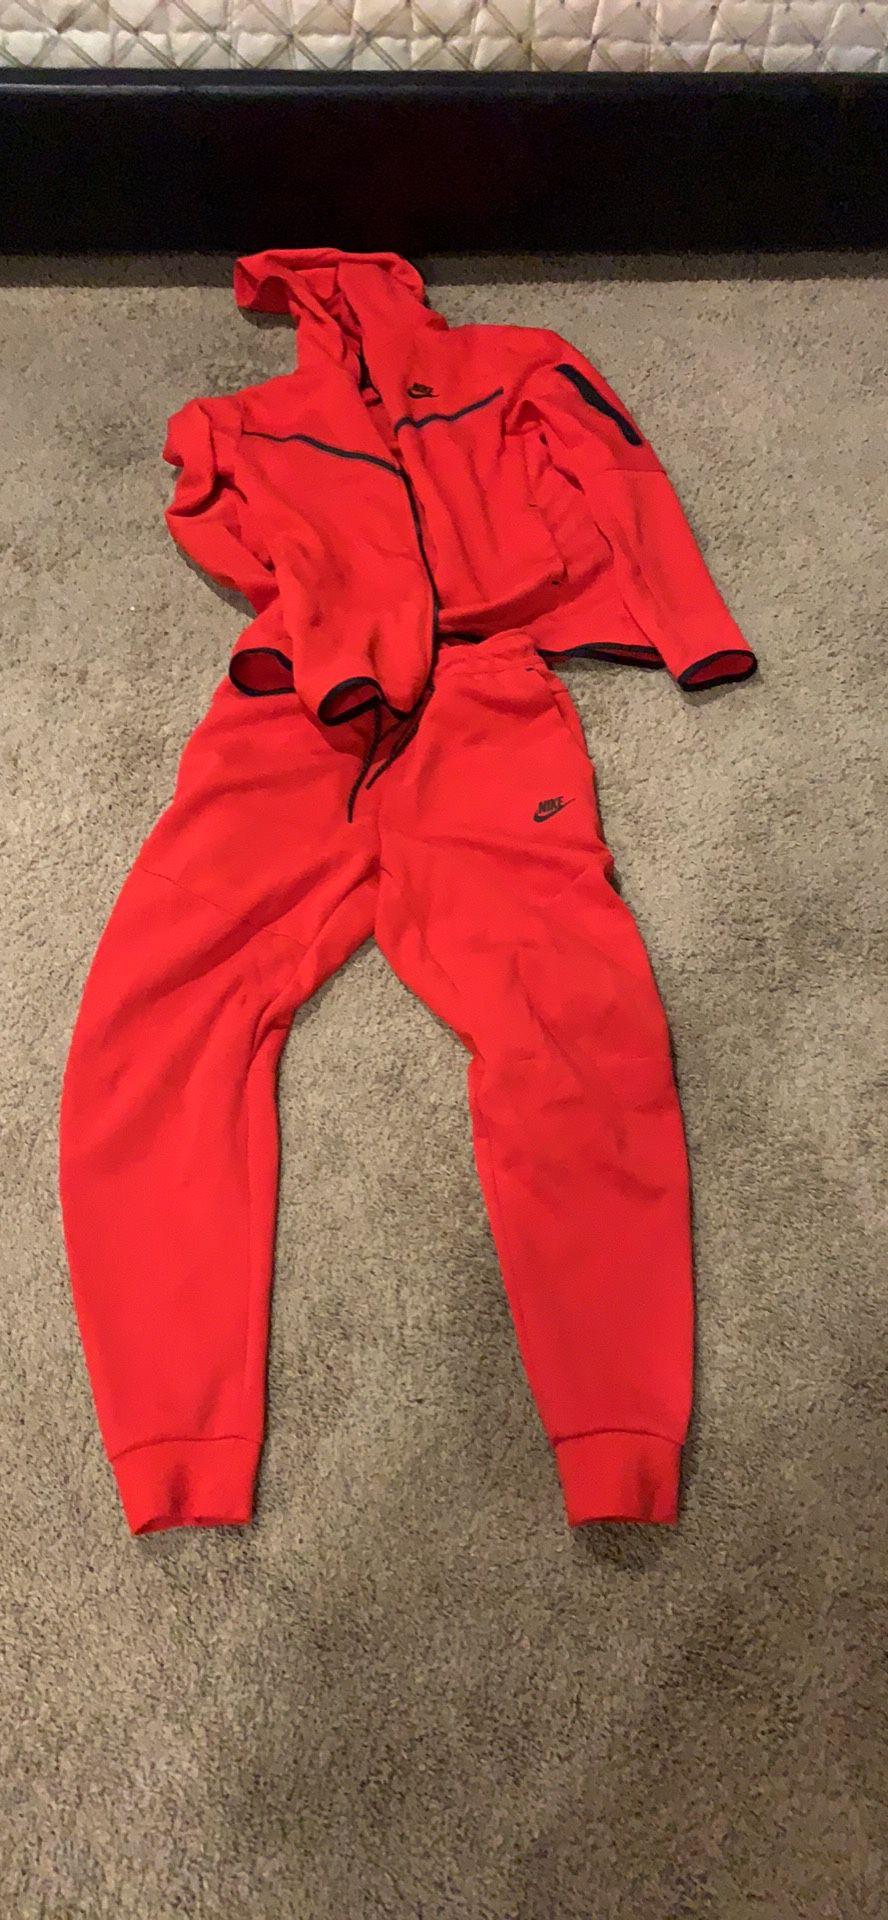 Nike Jumpsuit Size Medium